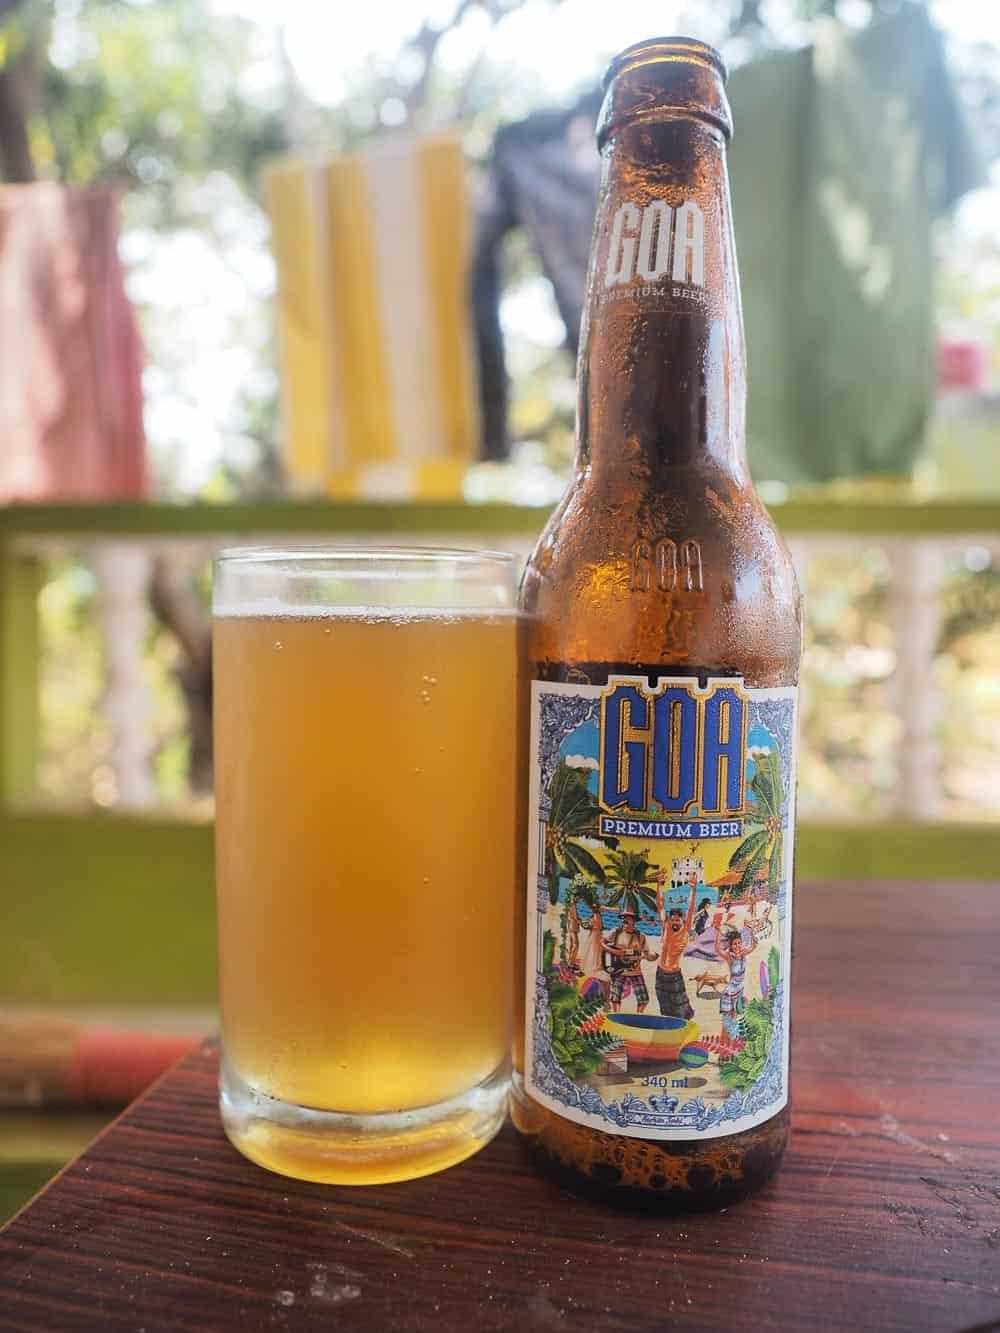 India Goa craft beer